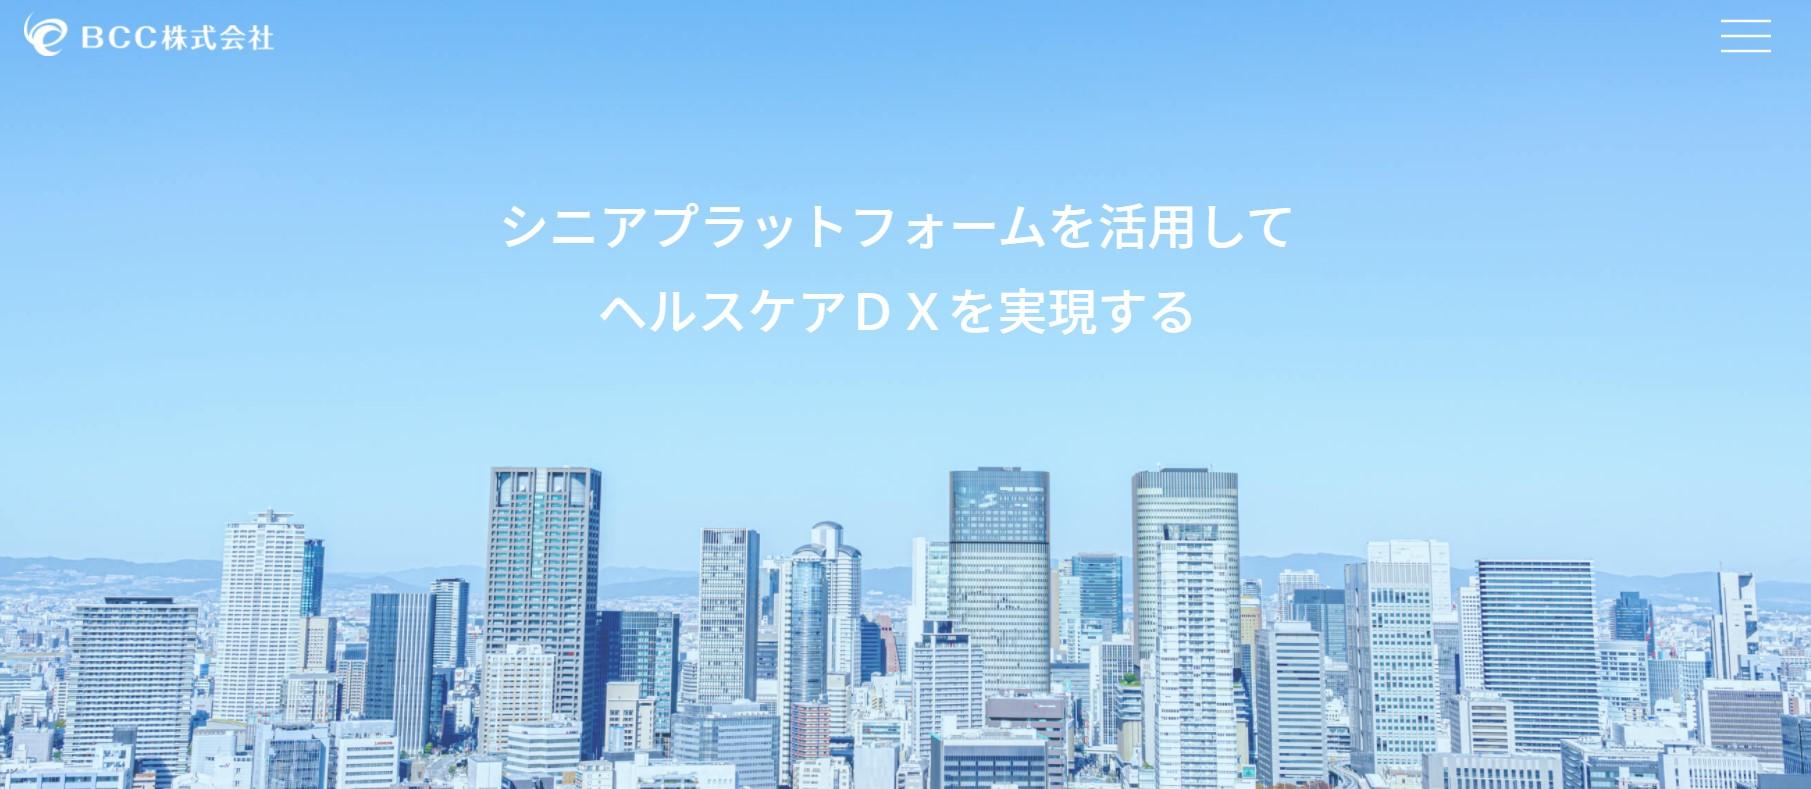 BCC(7376)IPO